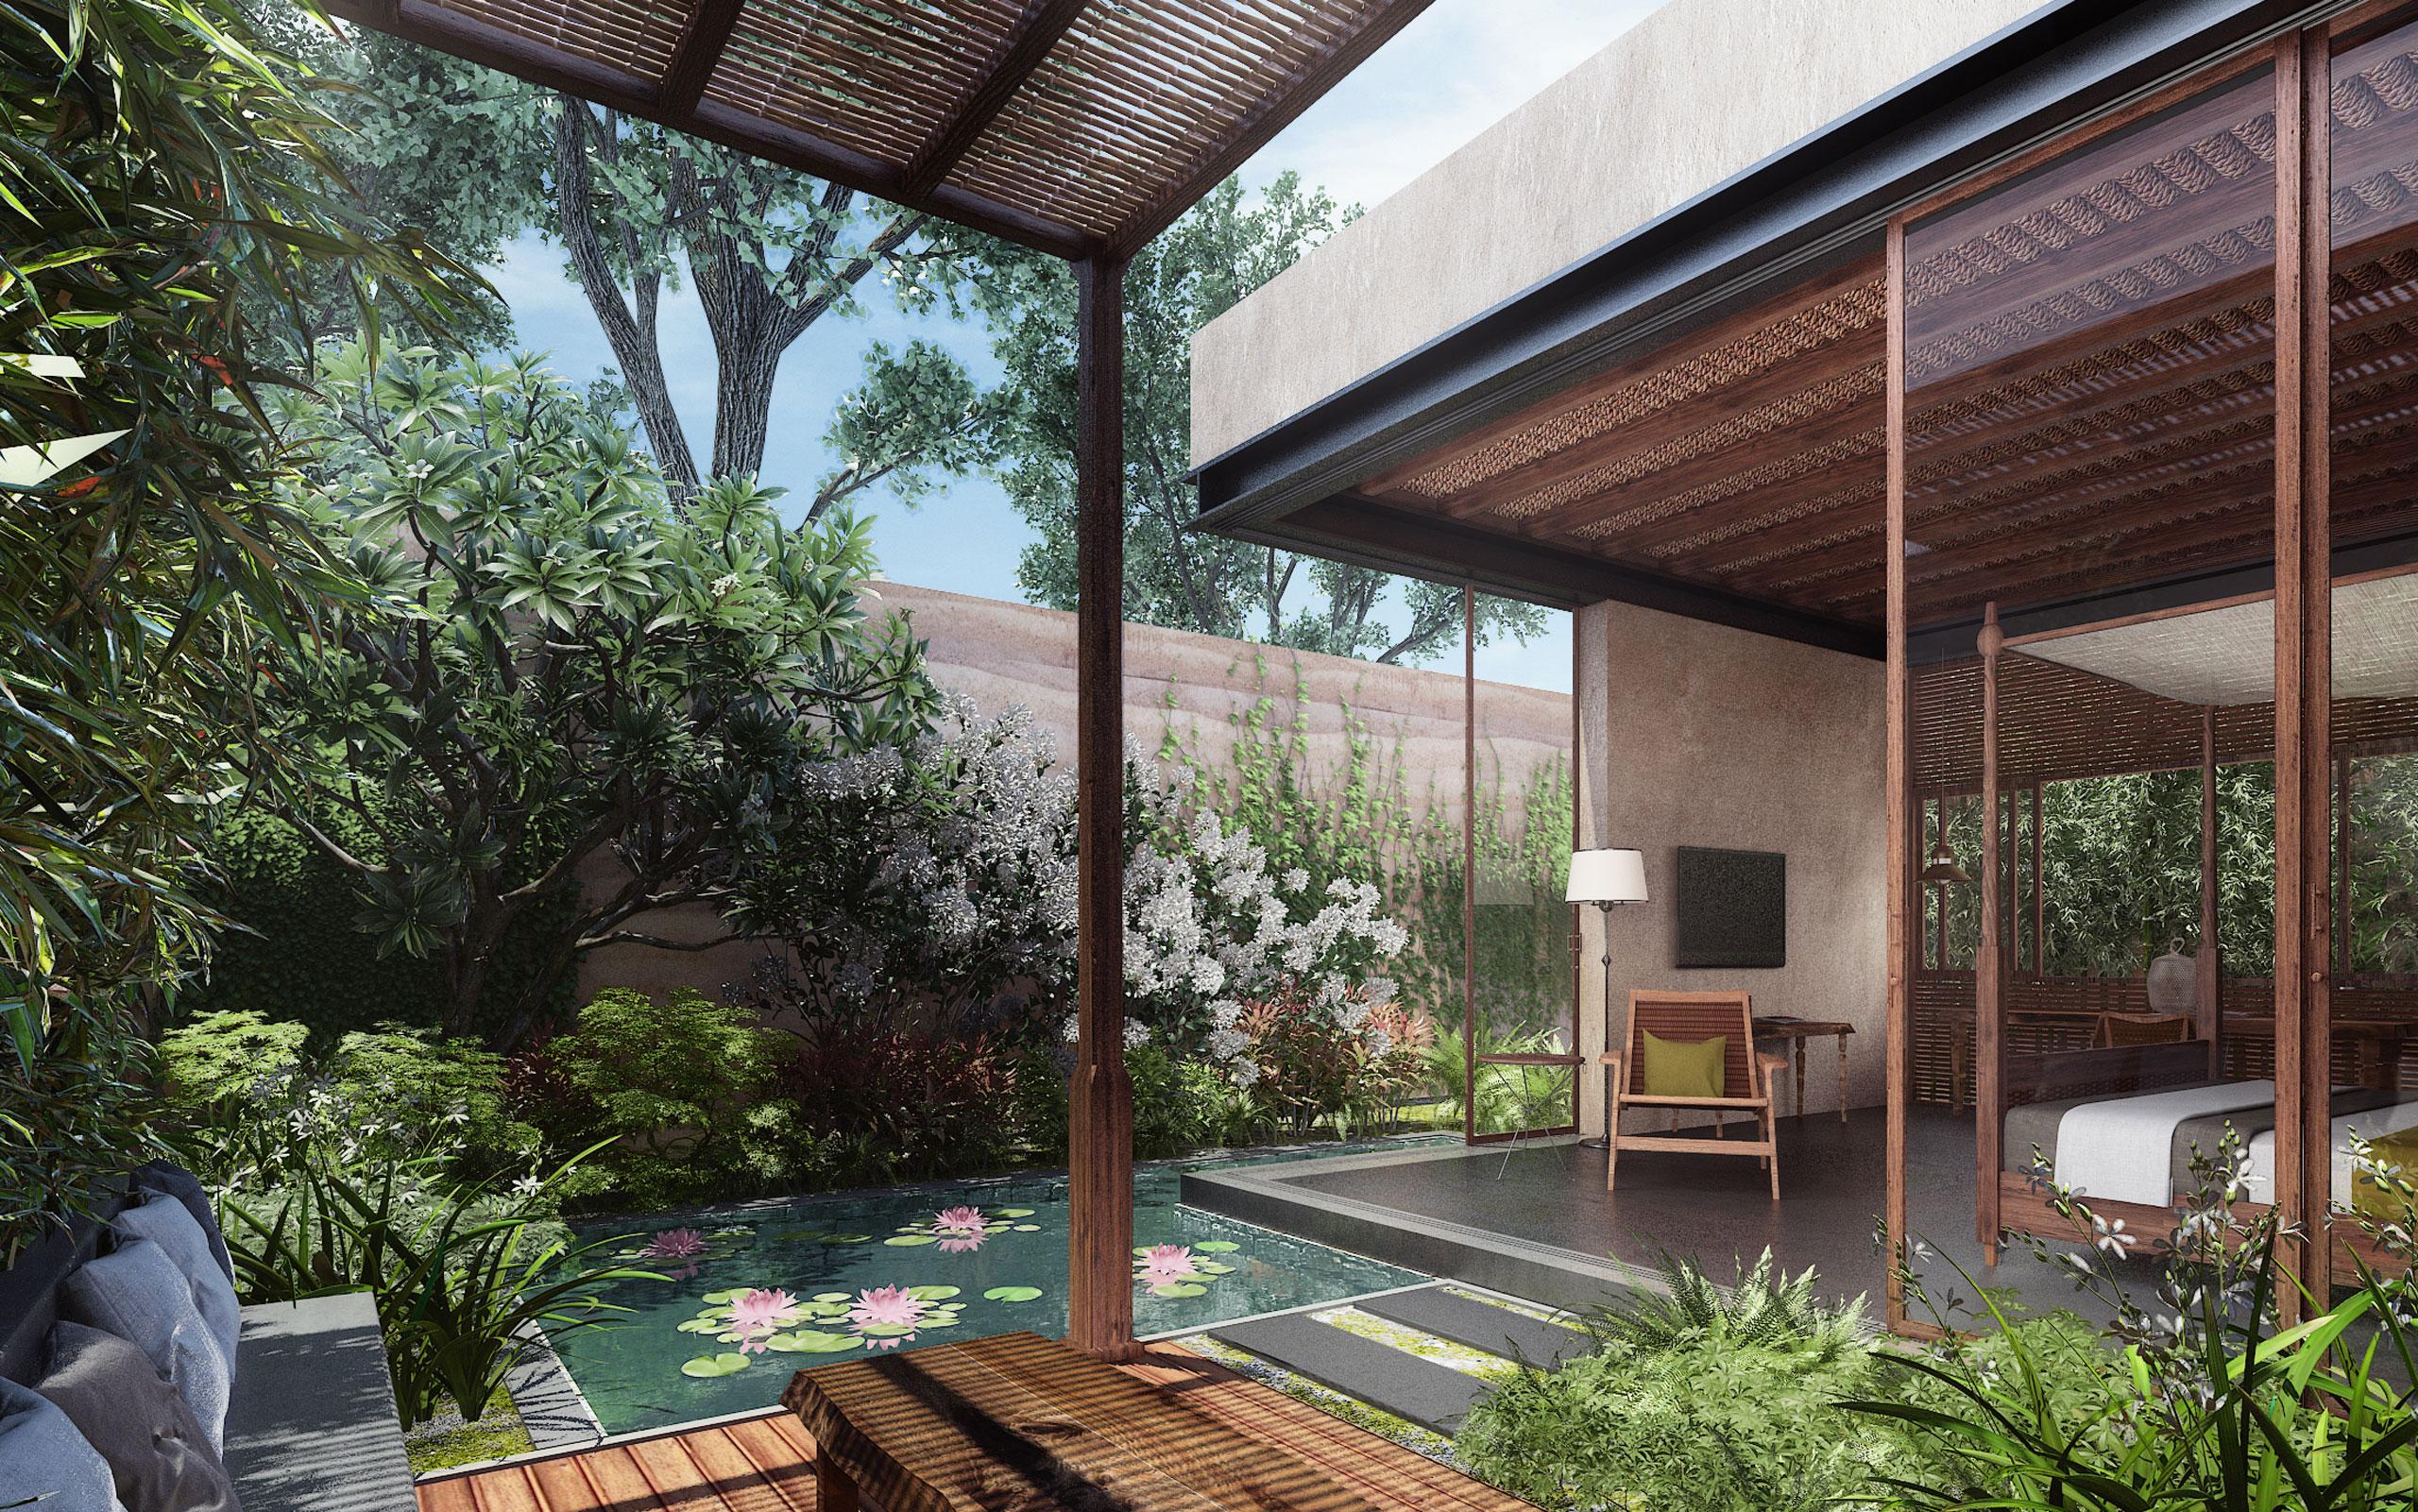 Mandwa Resort - private pool and Courtyard